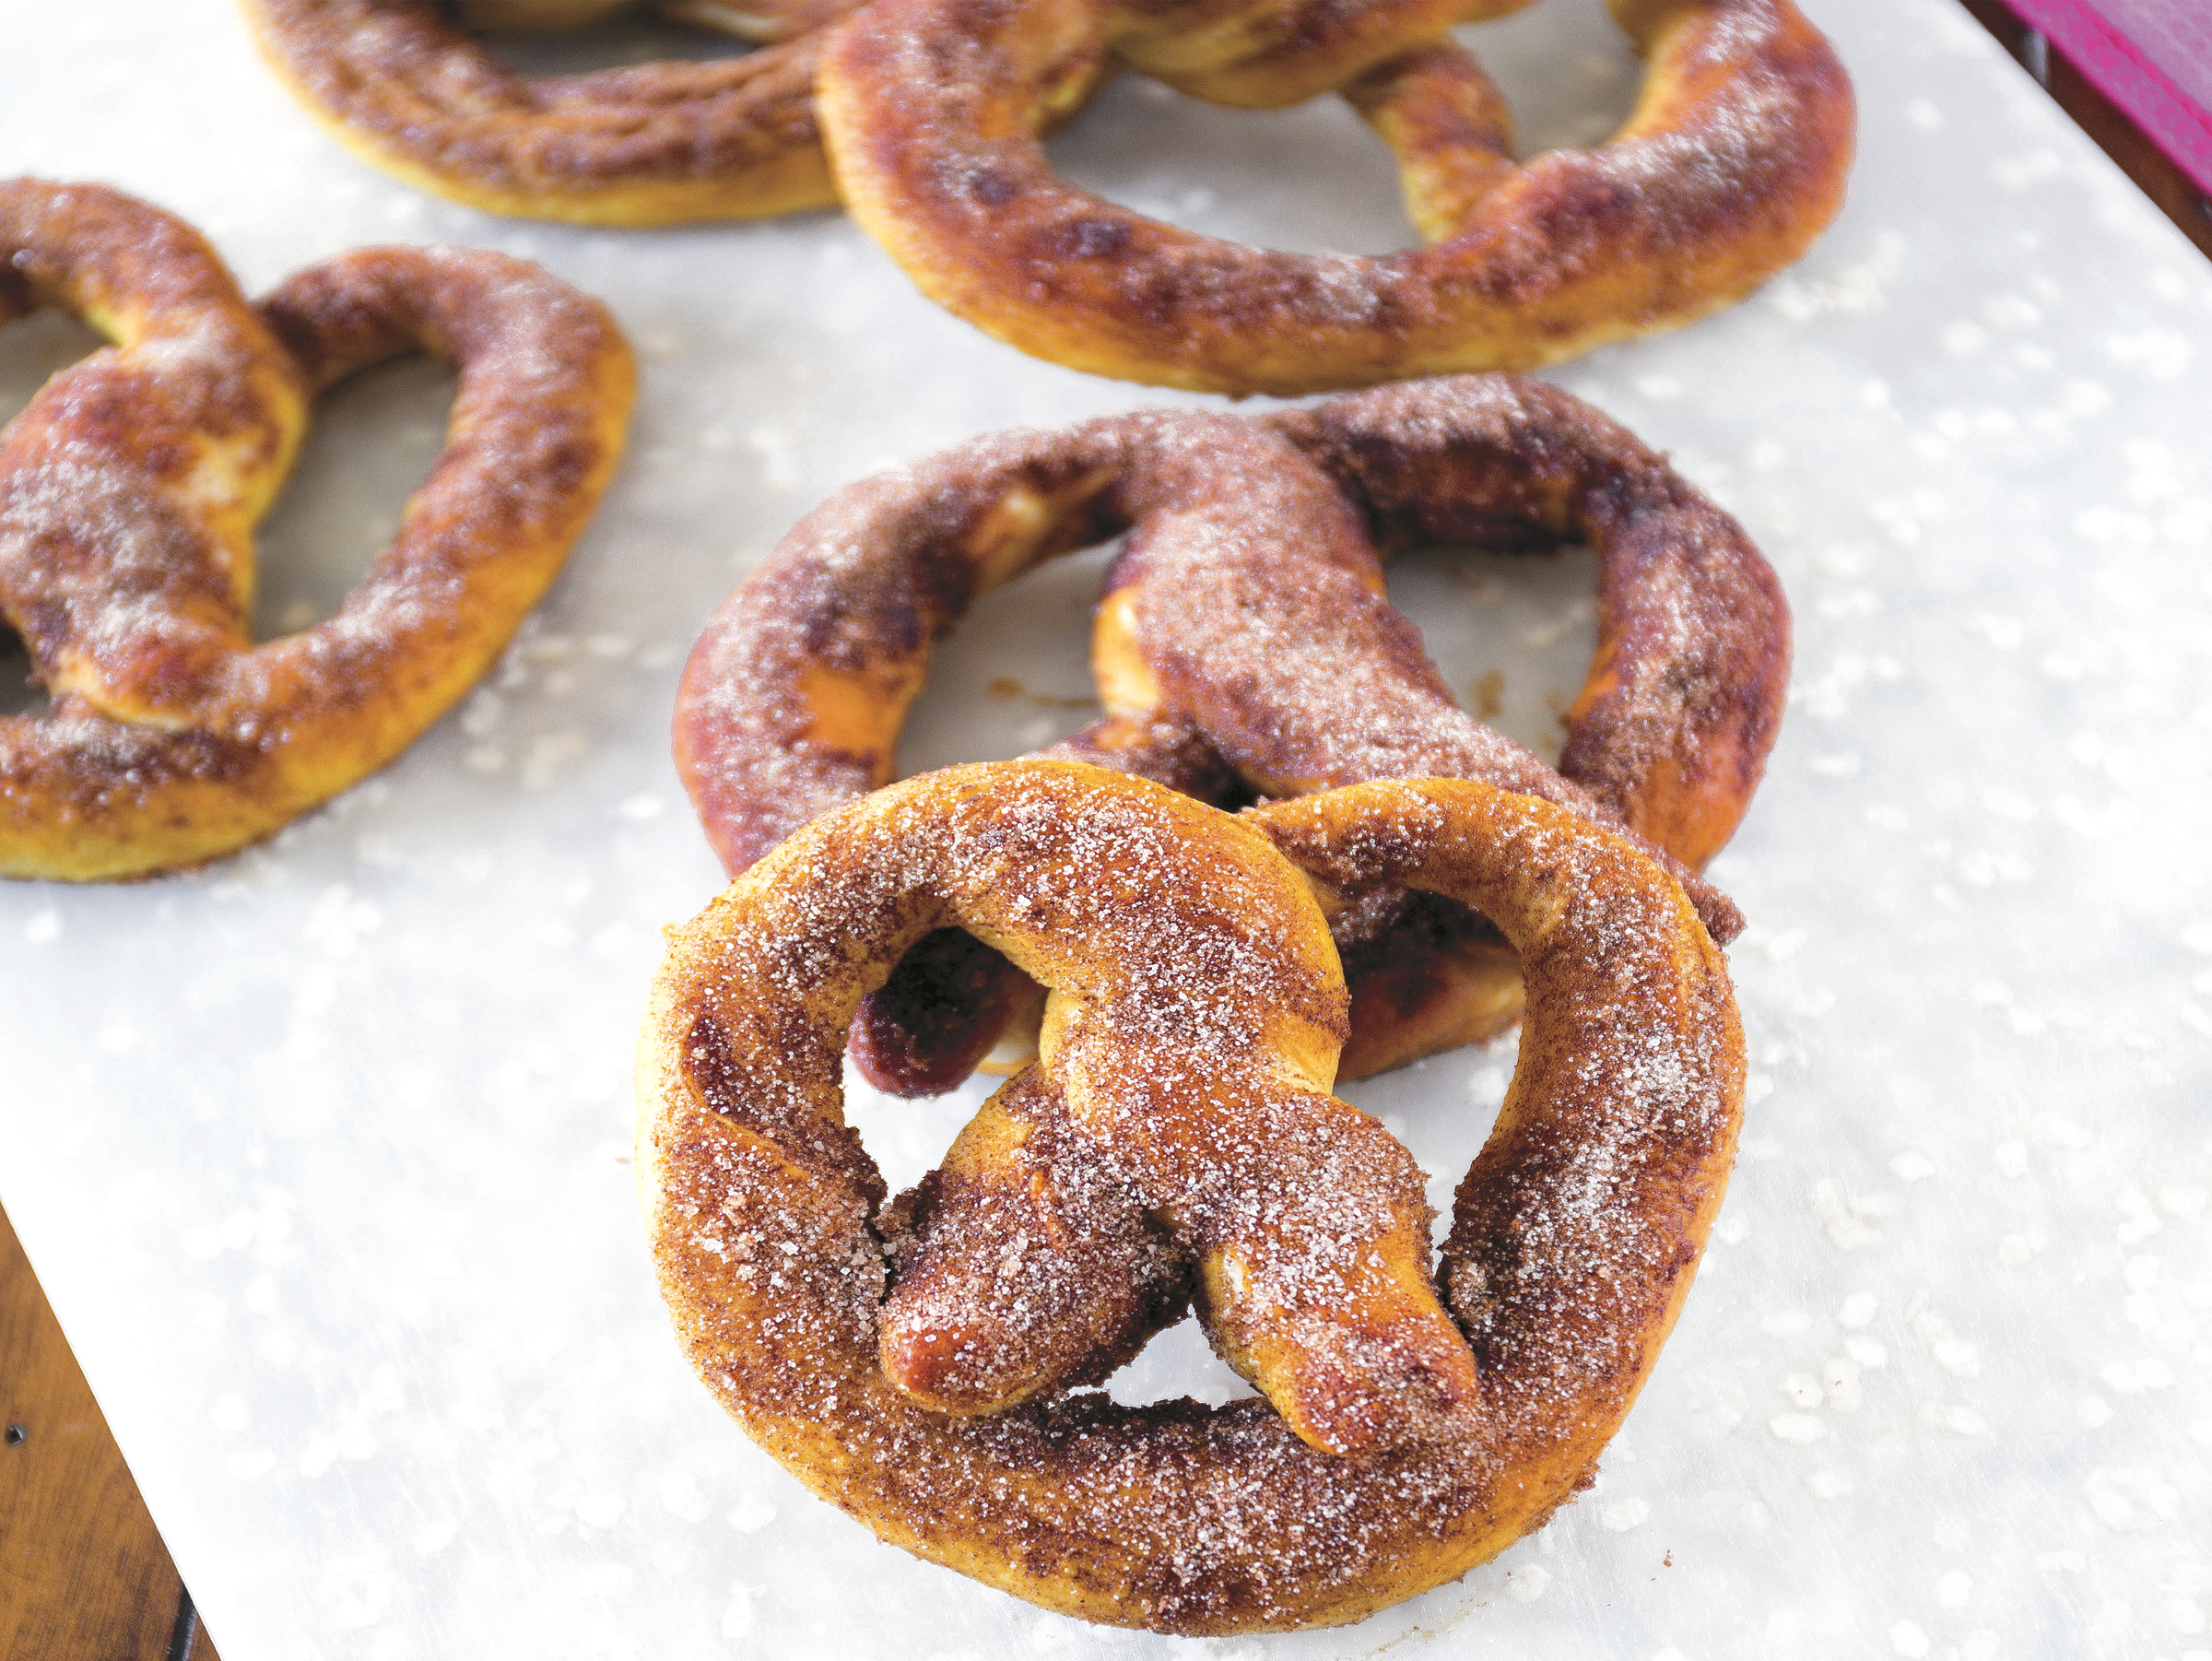 Cinnamon Sugar Soft Pretzels Recipe - Peg's Home Cooking